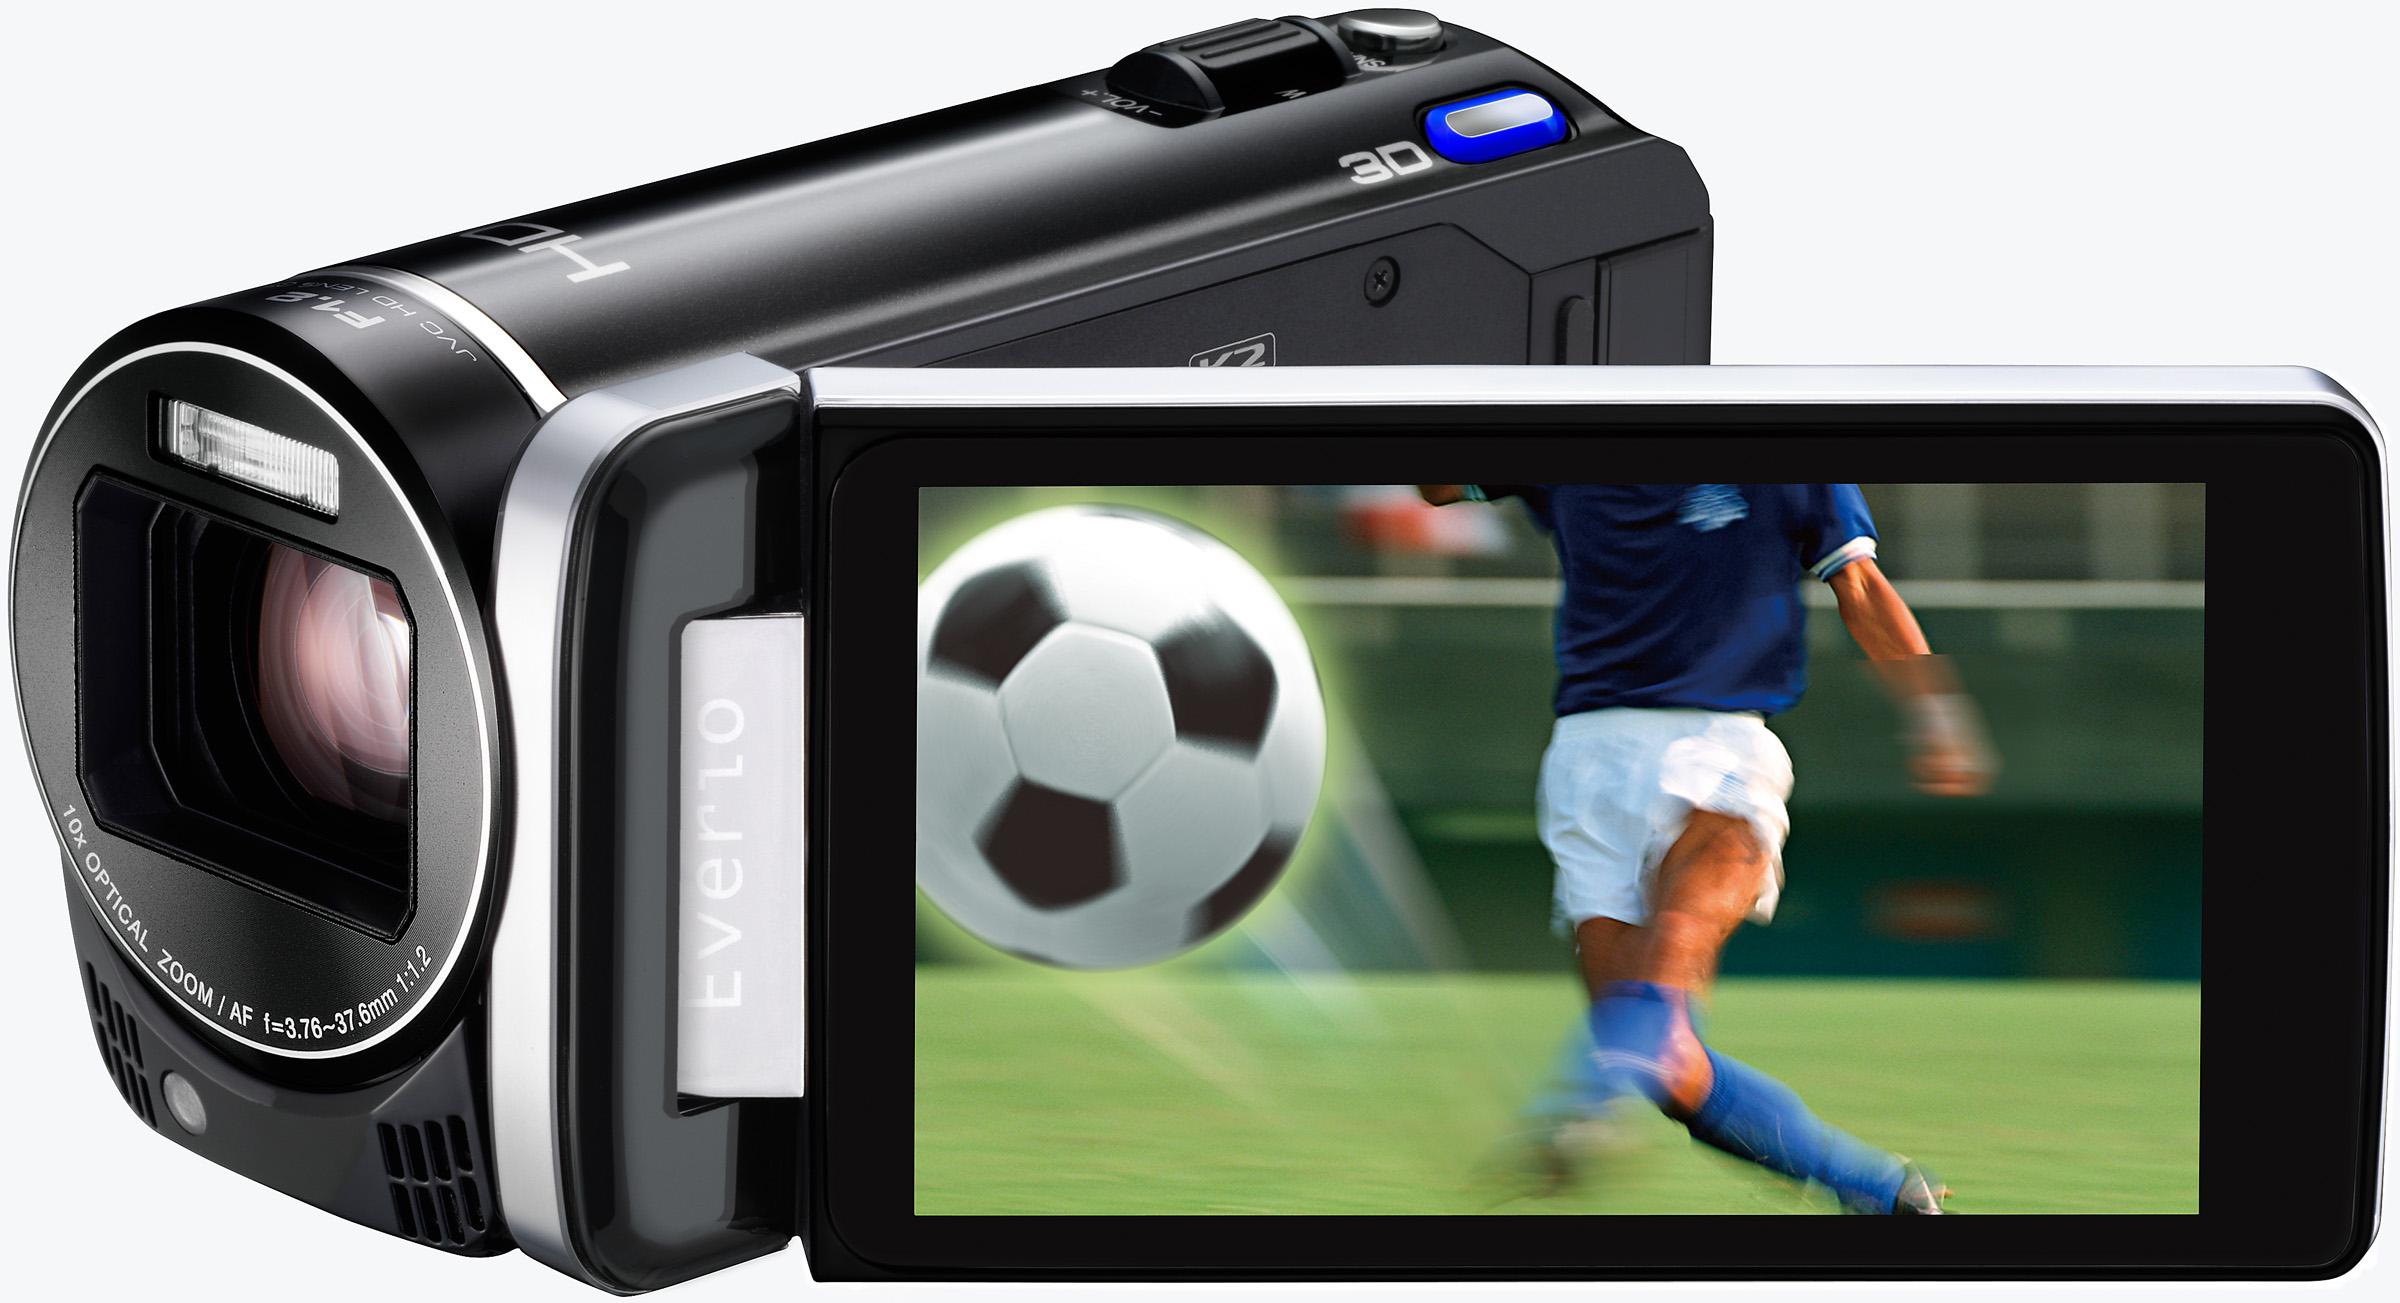 JVC全球首創第一部家用FULL HD高畫質3D攝影機  GS-TD1